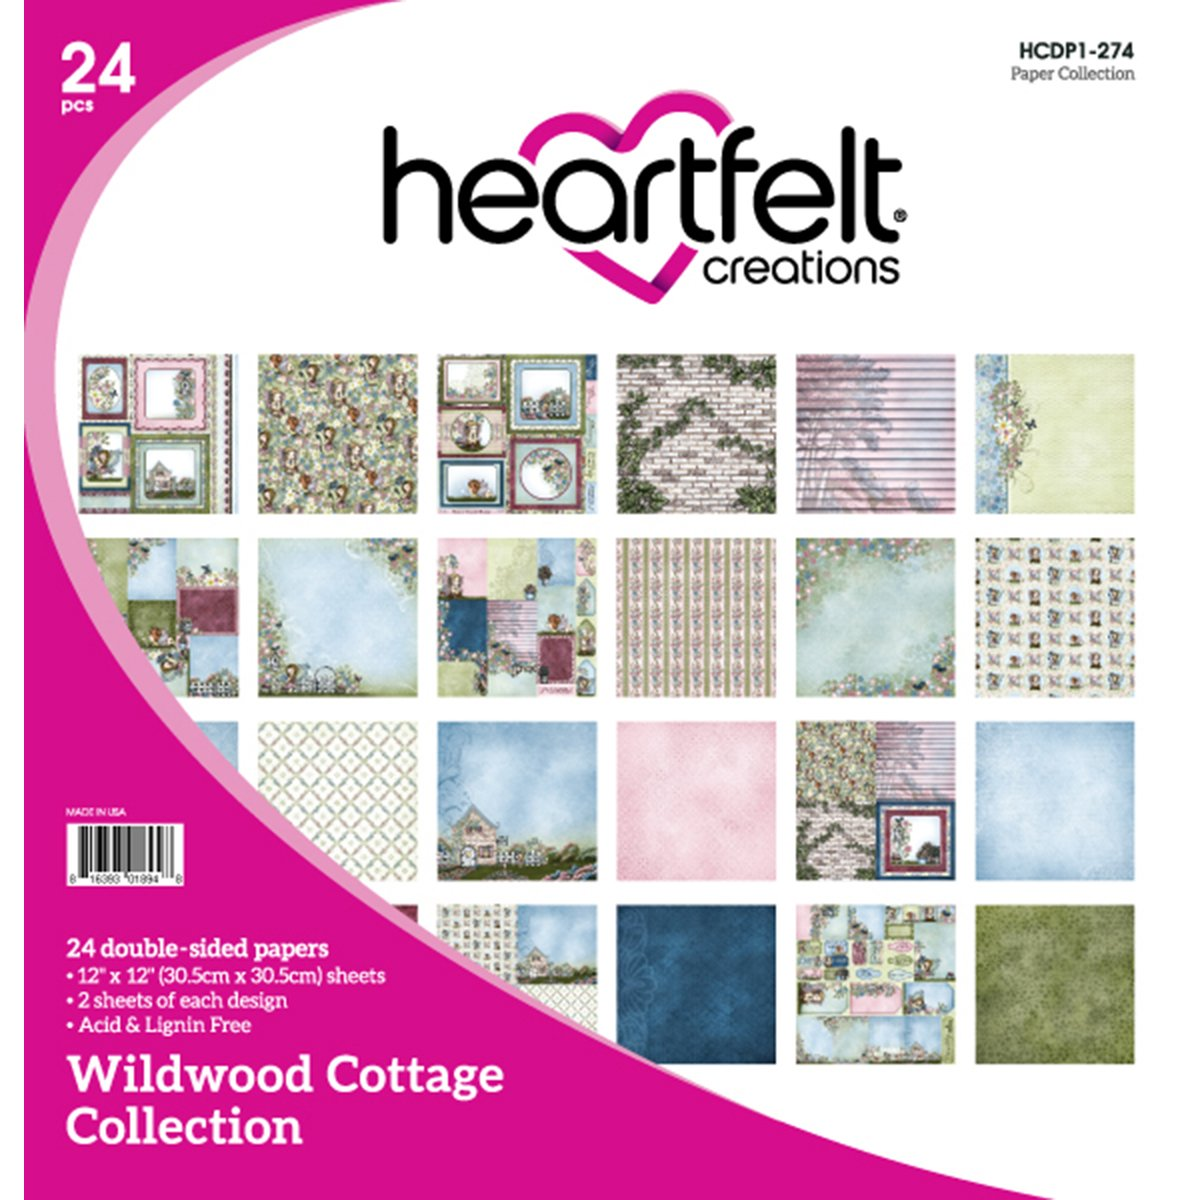 Heartfelt Creations Double-Sided Paper Pad, Multi-Colour, 31.75 x 30.48 x 0.76 cm